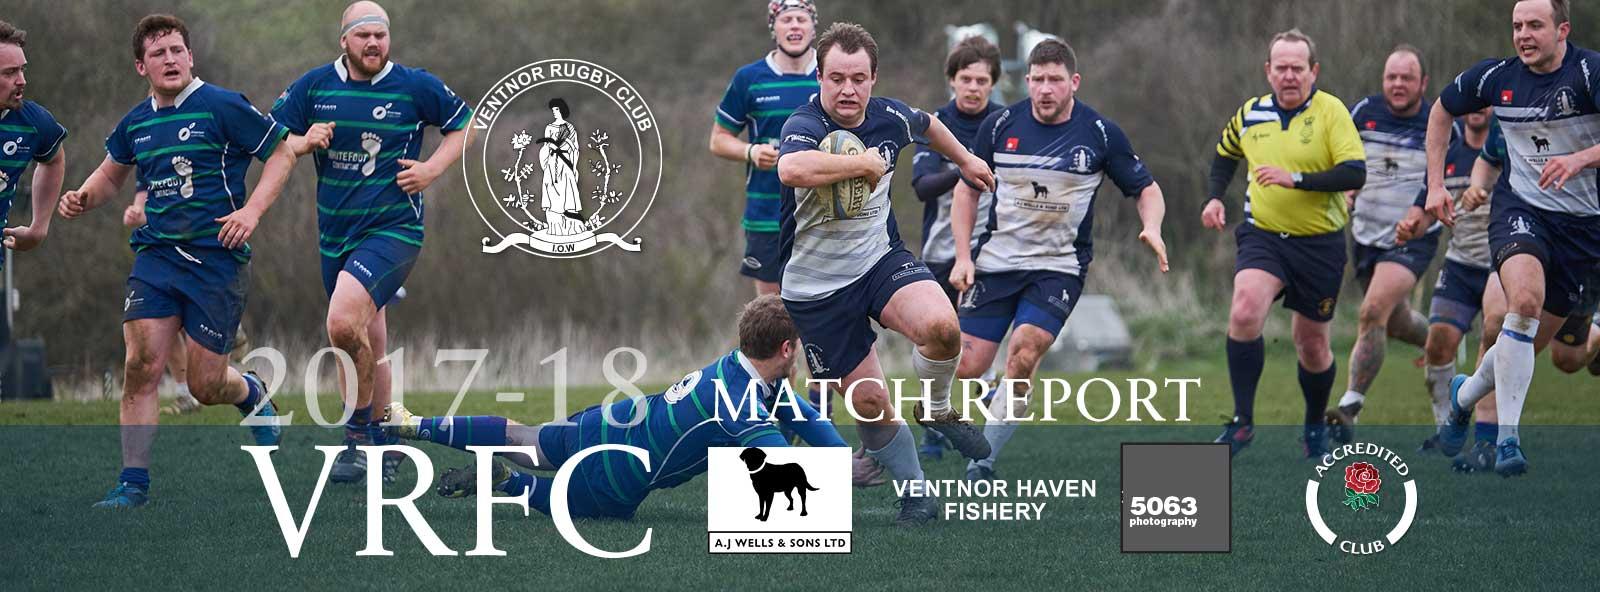 Ventnor-RFC-1XV-v-Overton-RFC-1XV-07042018-match-report-1600-wide-x-315